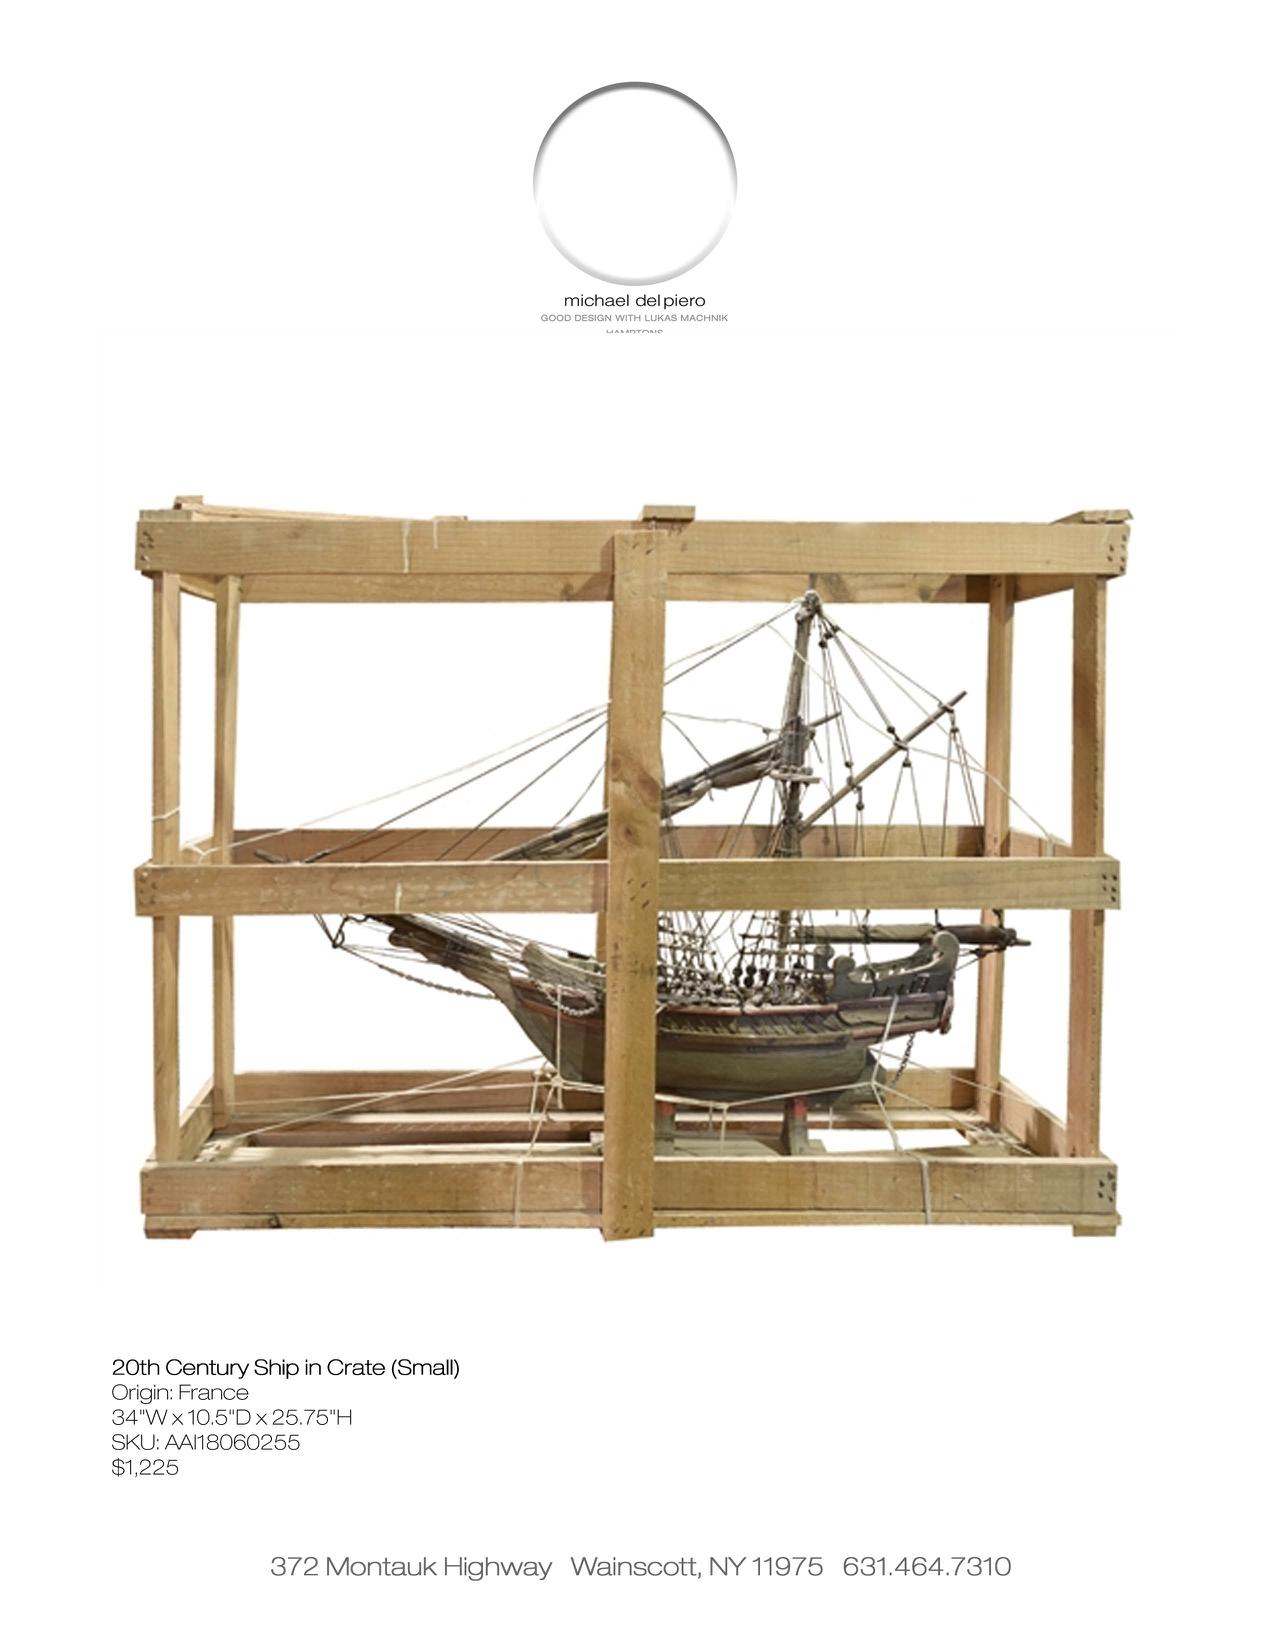 AAI18060255 20th Century Ship in Crate (Small).jpg